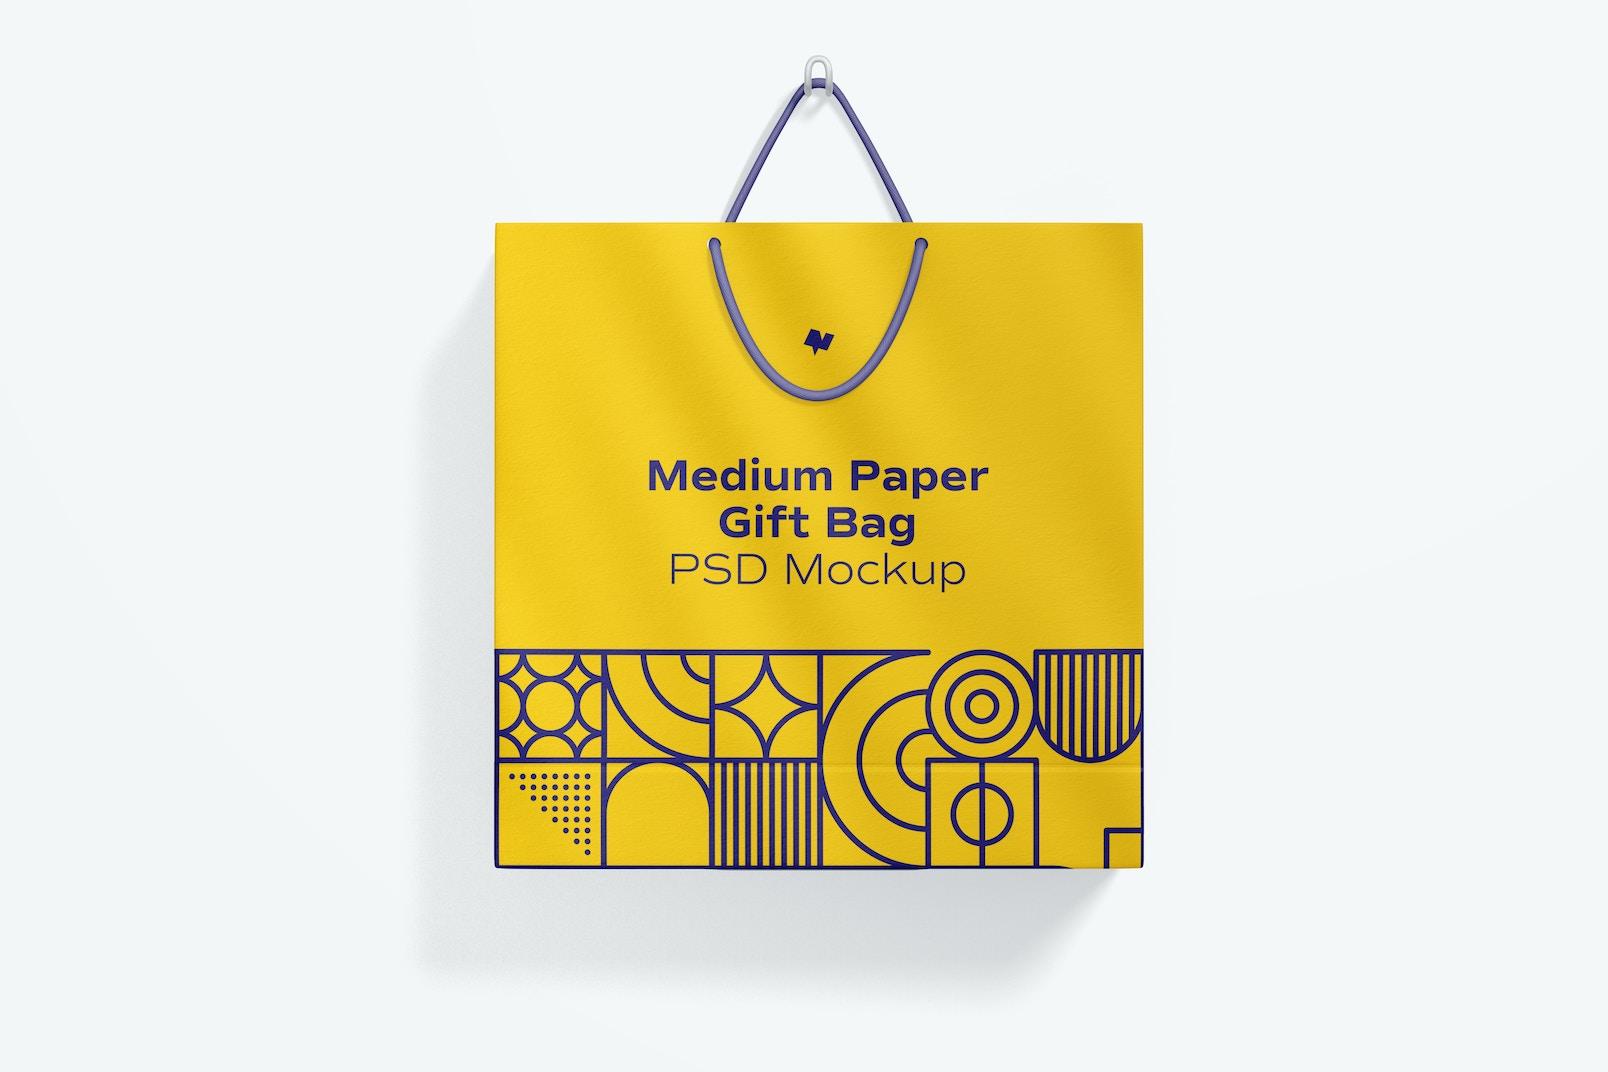 Medium Paper Gift Bag With Rope Handle Mockup, Hanging